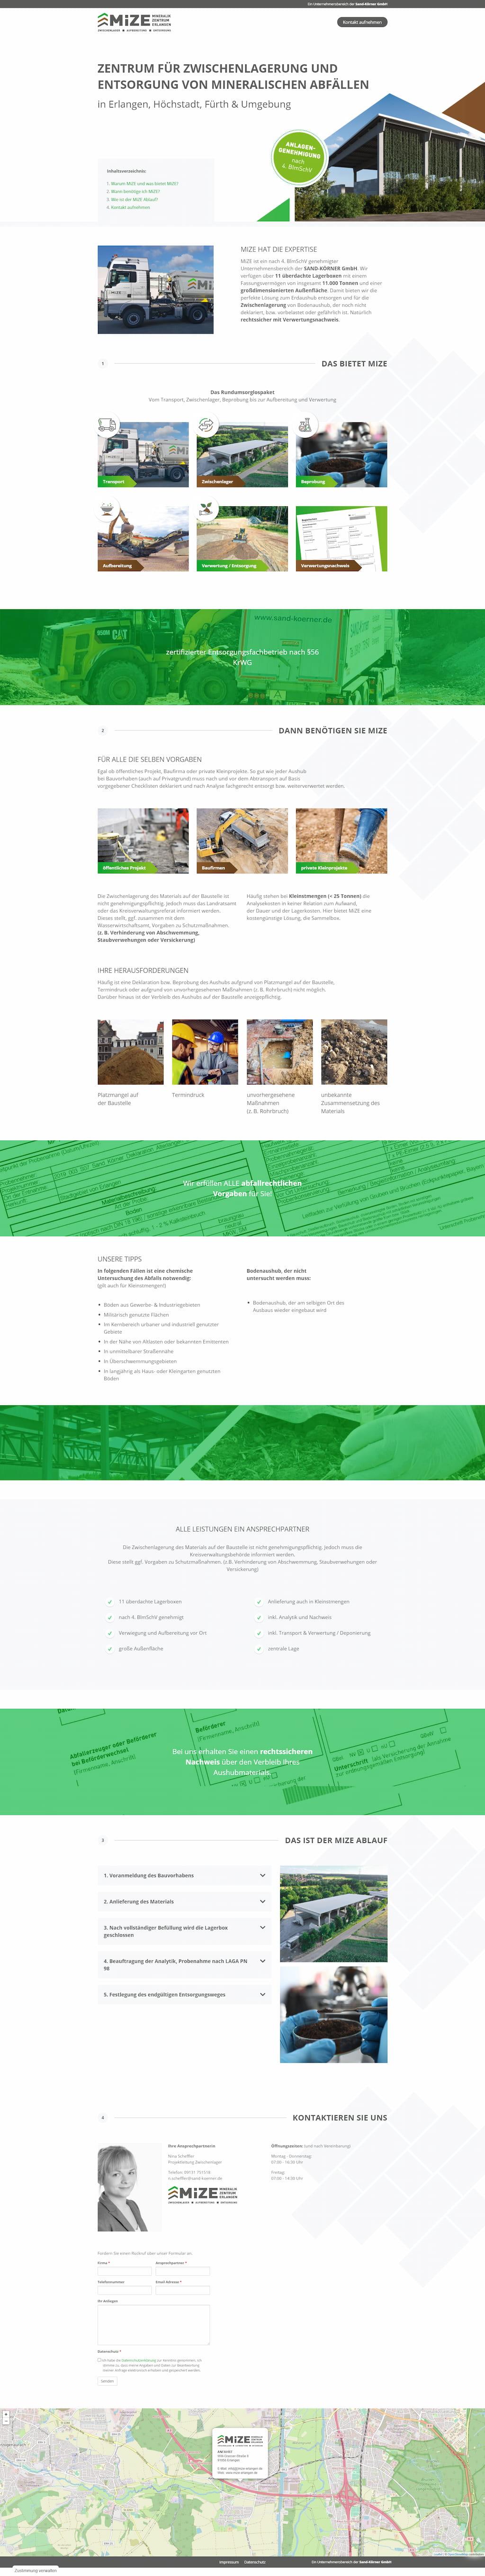 mize-responsive-webdesign